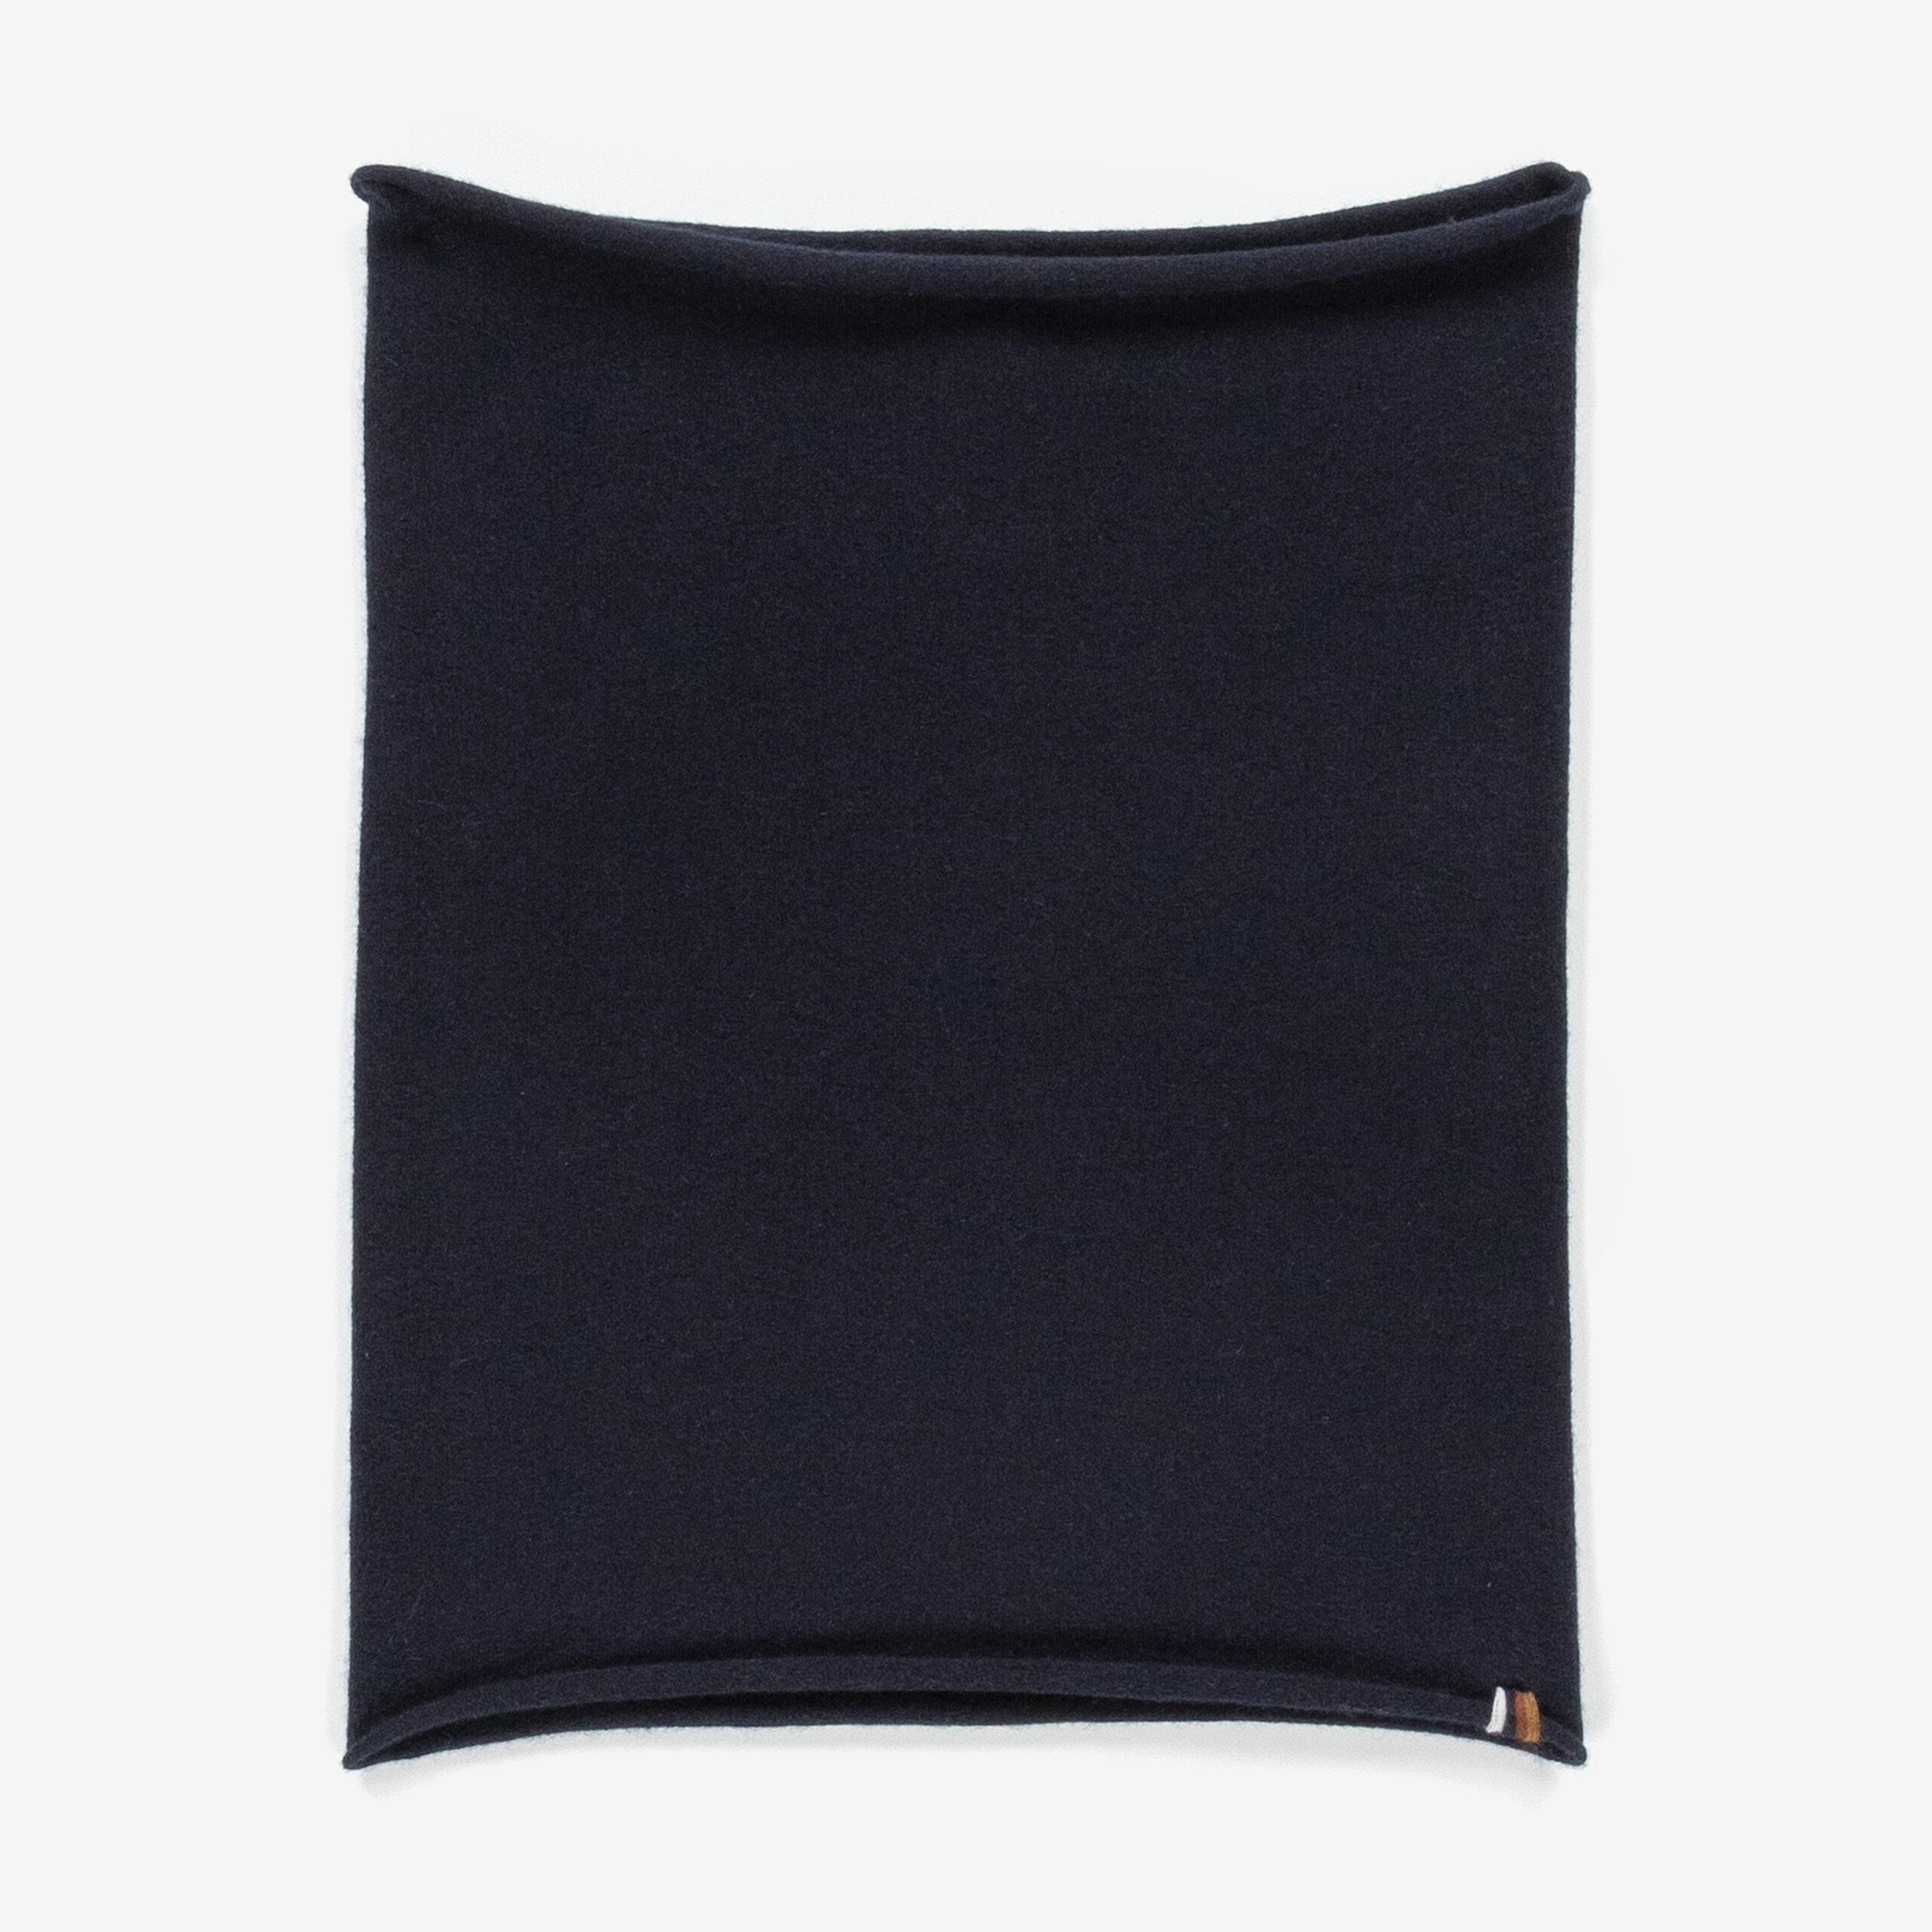 Mini Tube, Gürtel, Extreme Cashmere, Accessoire, Navy